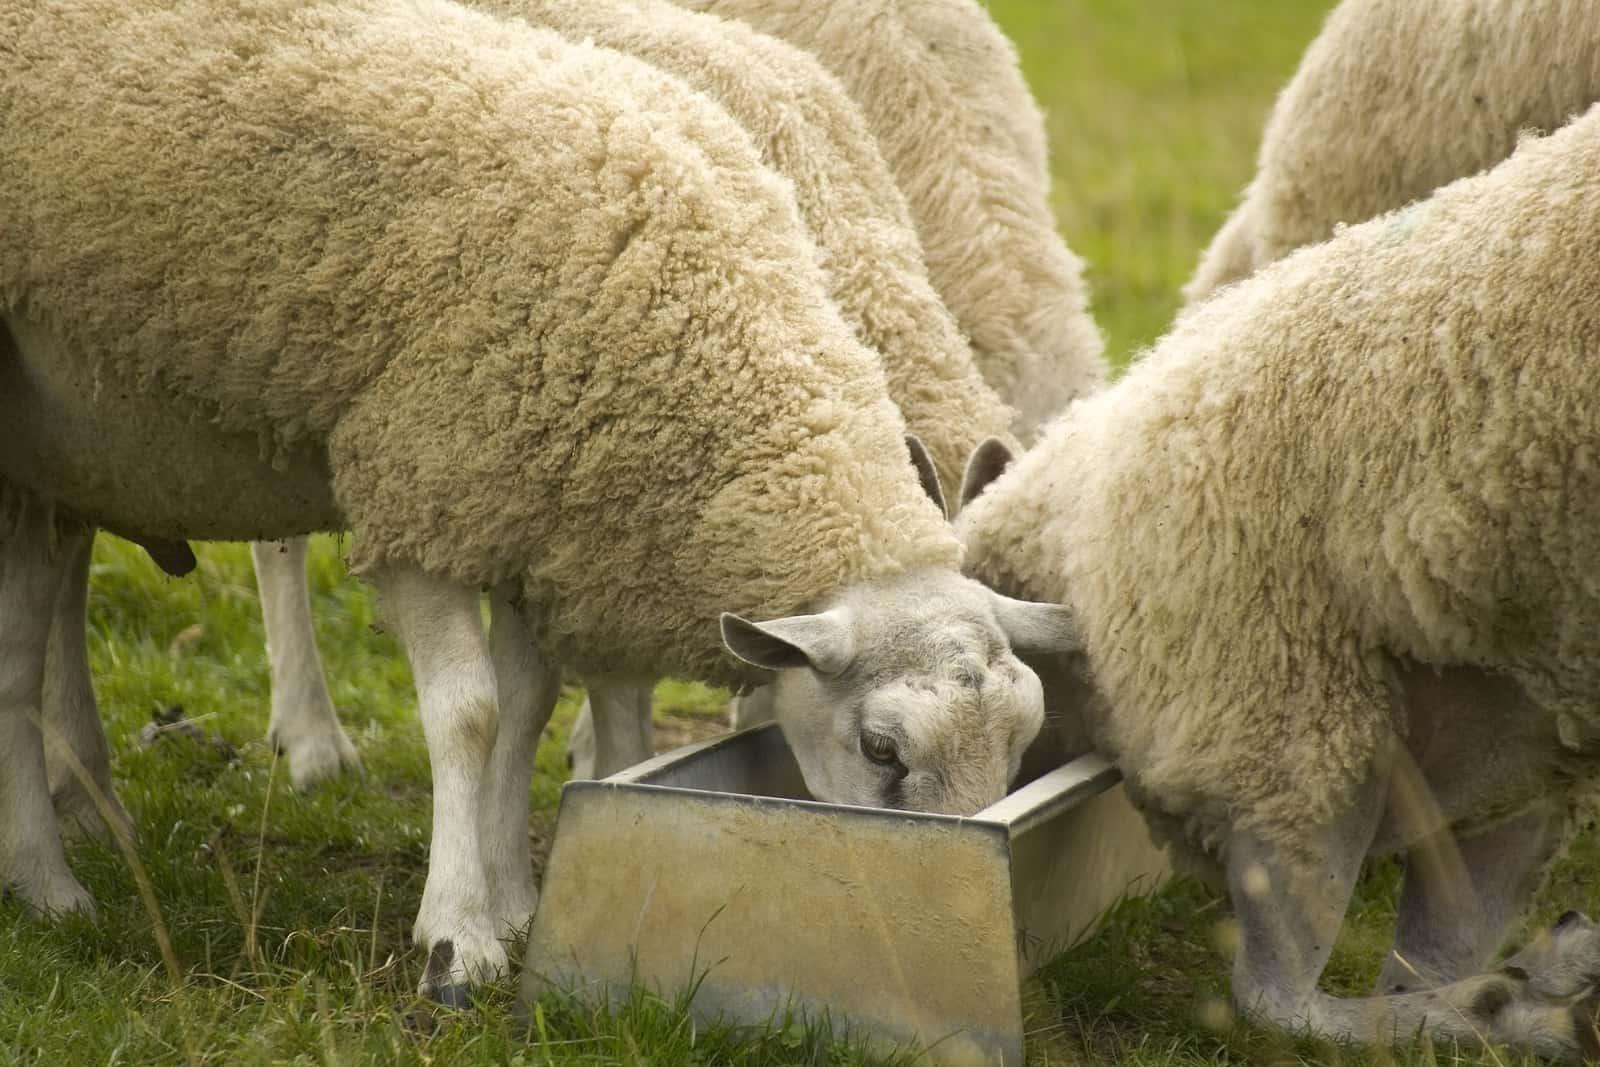 Sheep feeding around trough